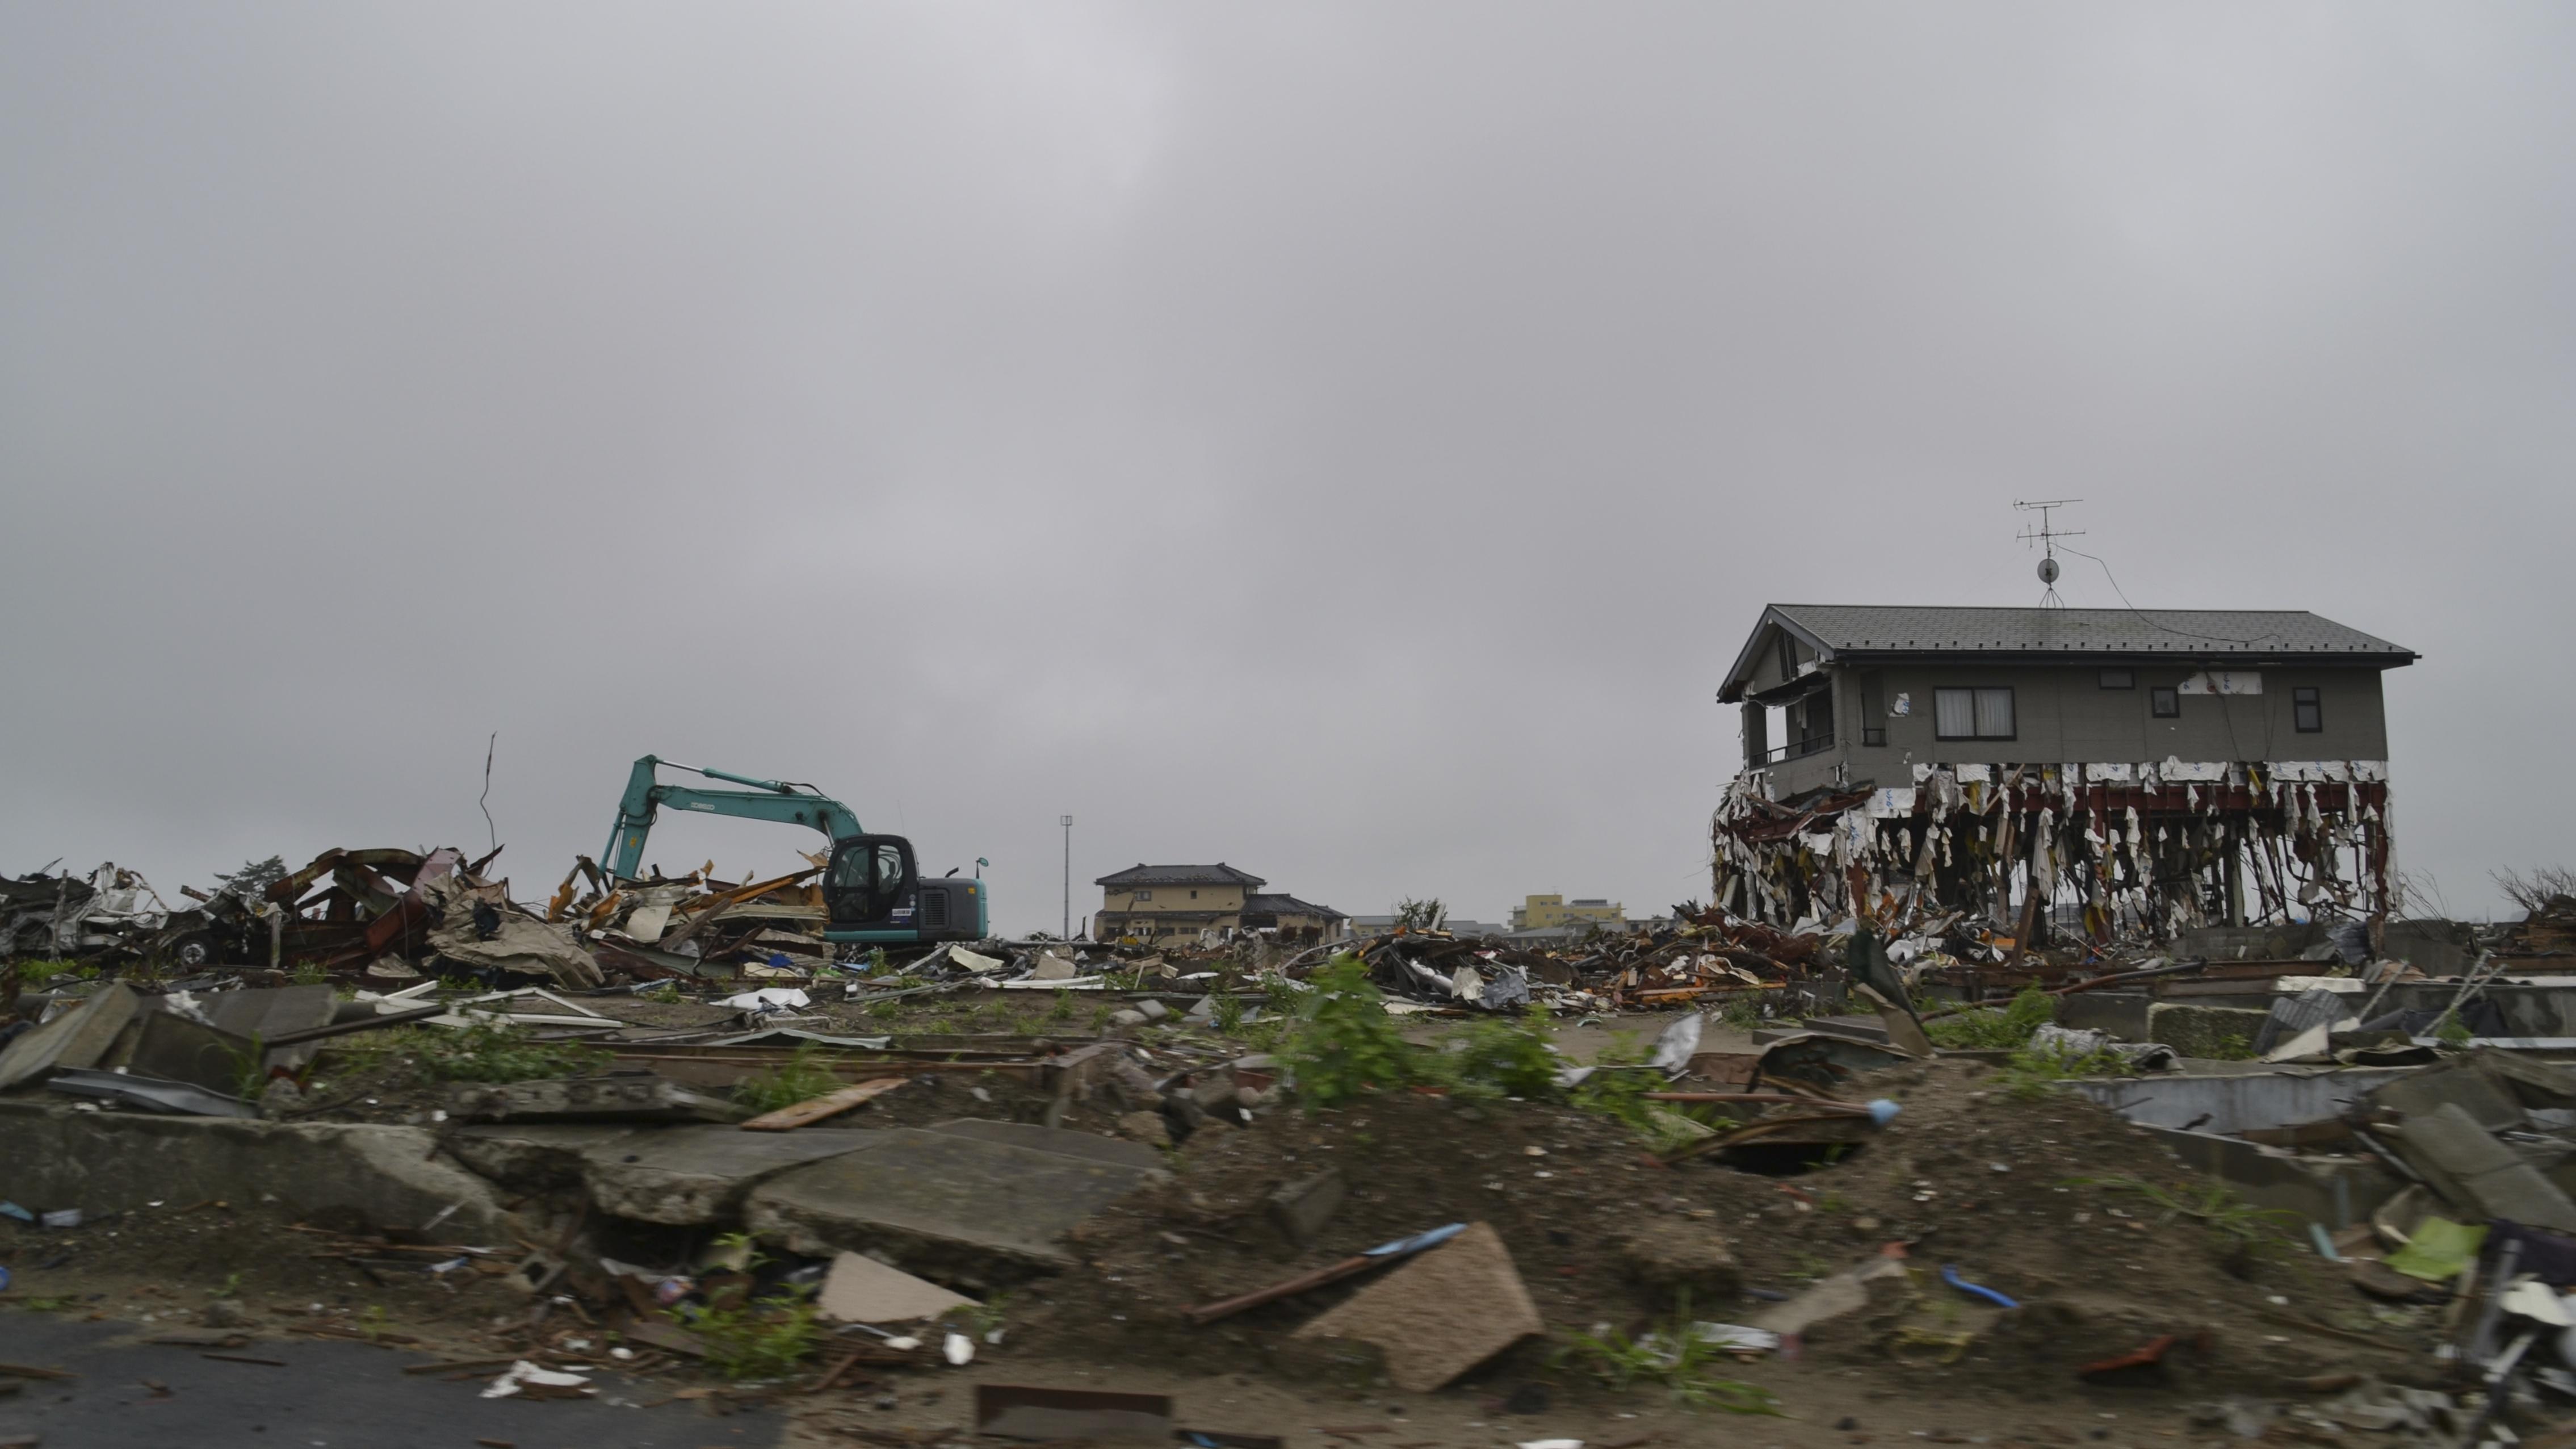 arahama tsunami through house debris.jpg